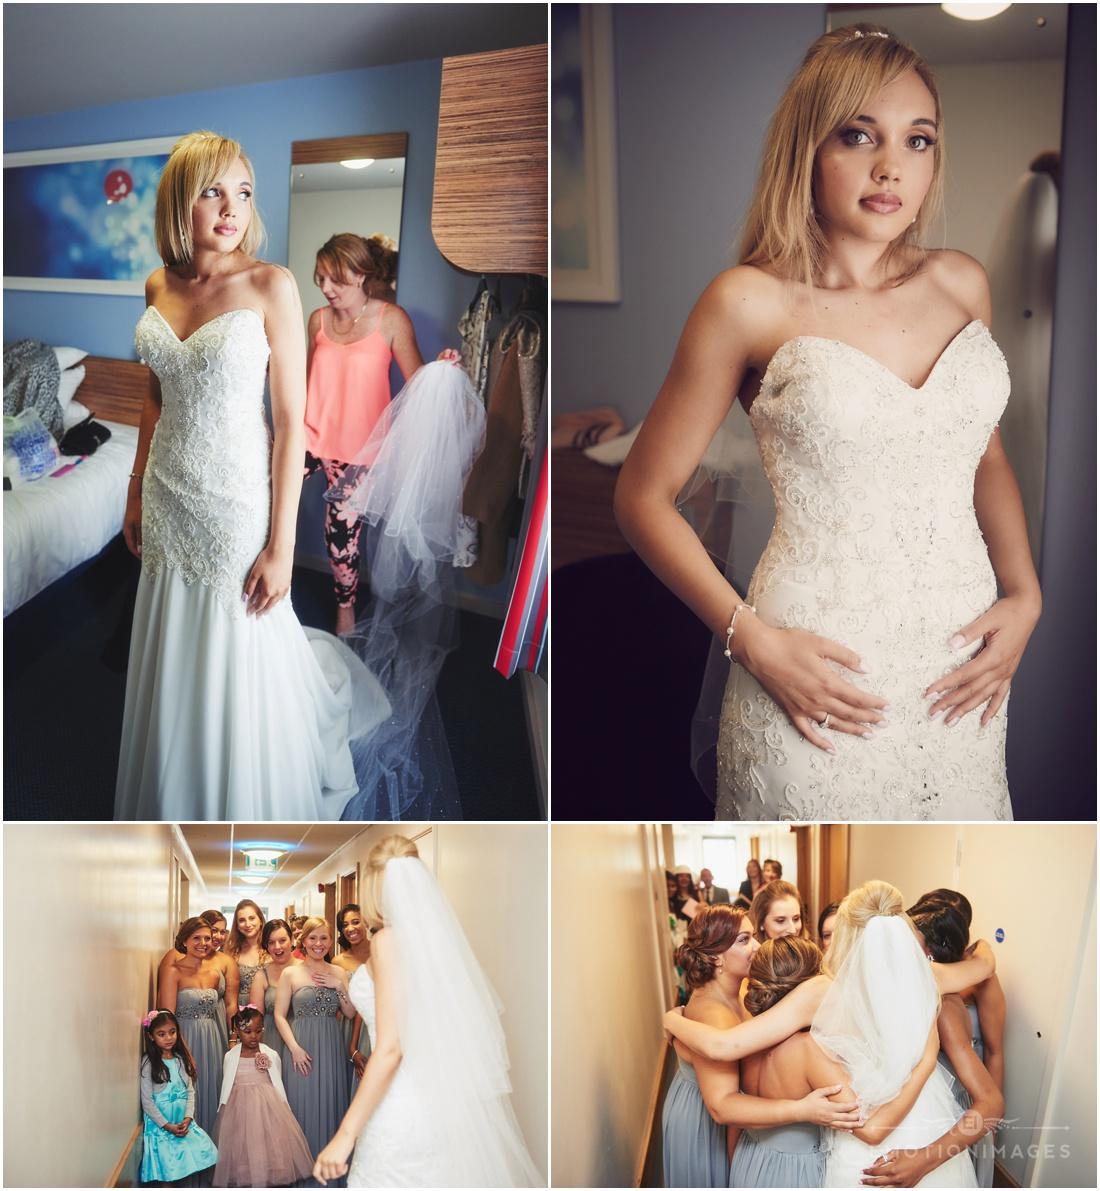 York_House_Twickenham_Wedding_Photography_005.JPG